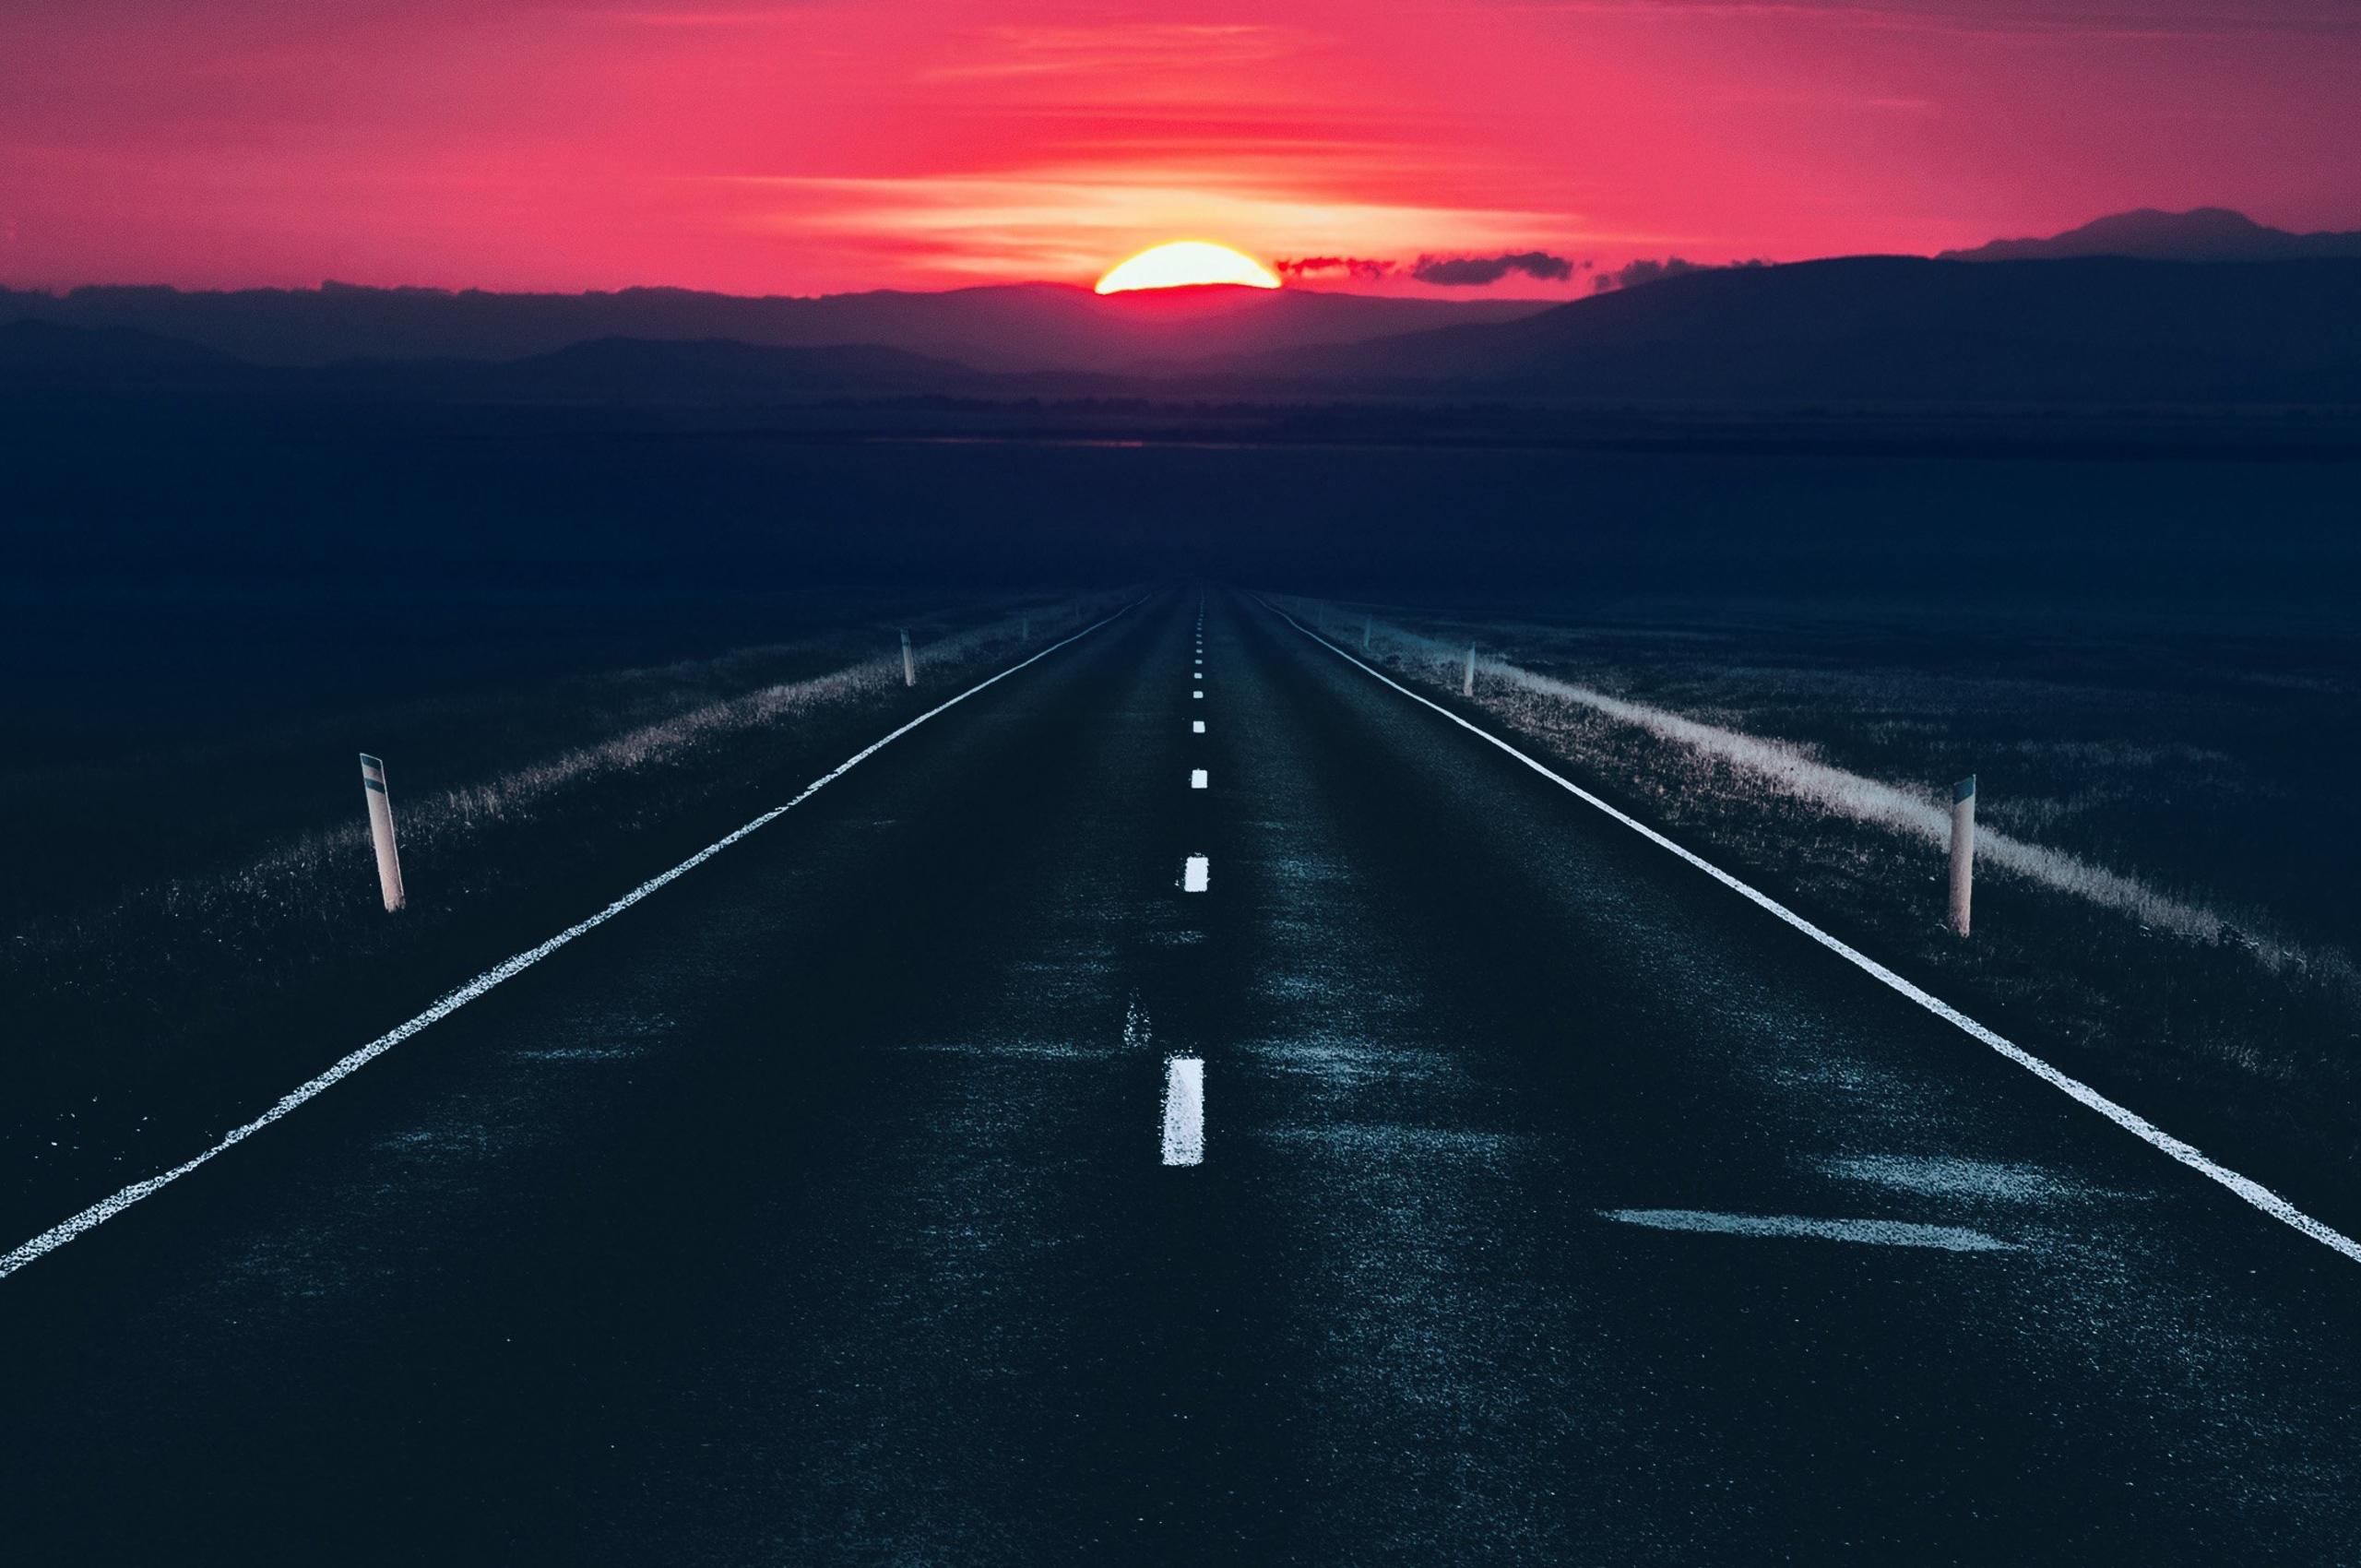 long-alone-dark-road-sunset-view-z7.jpg